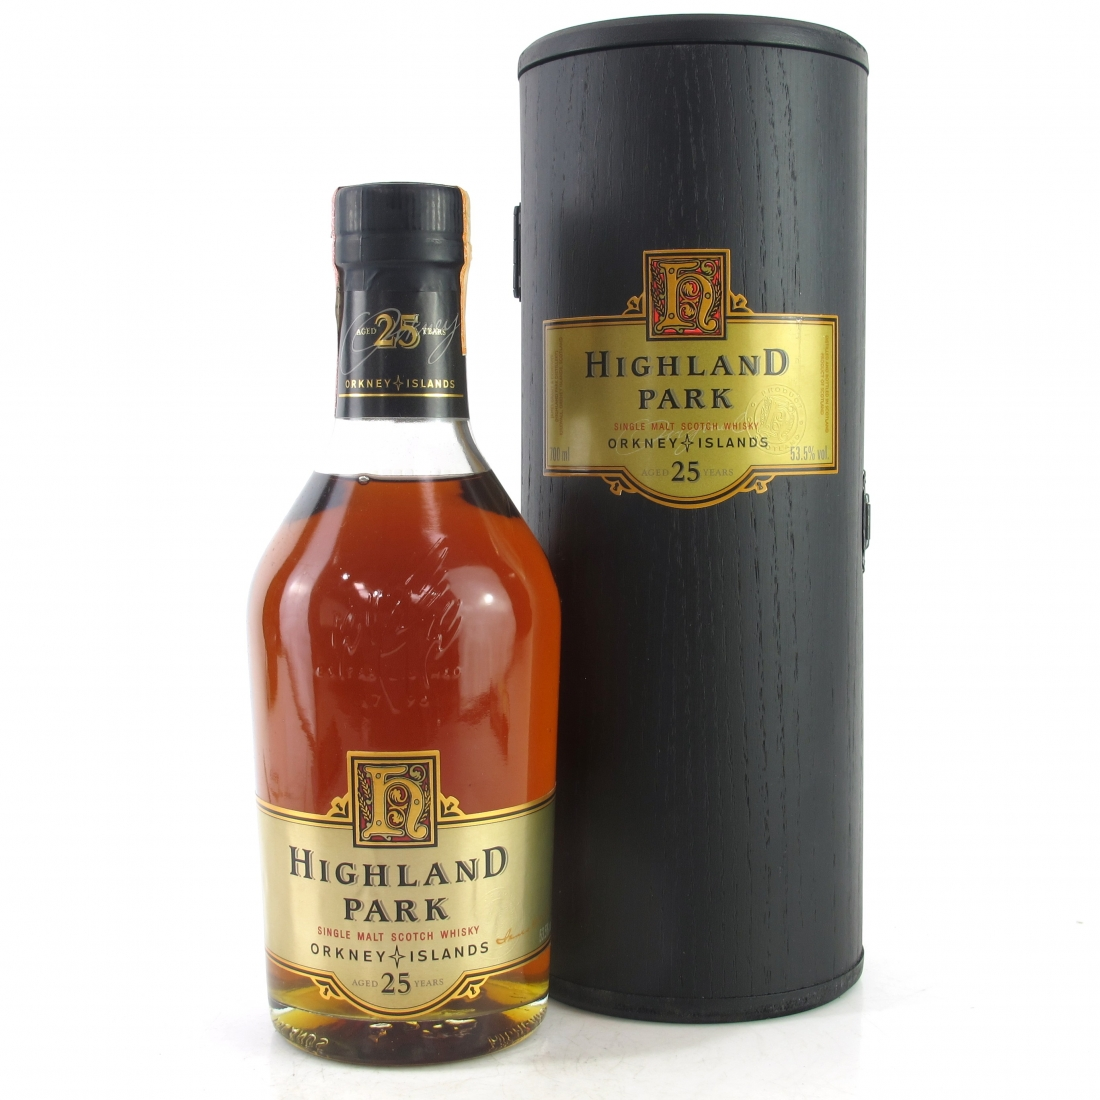 Highland Park 25 Year Old / 53.5%